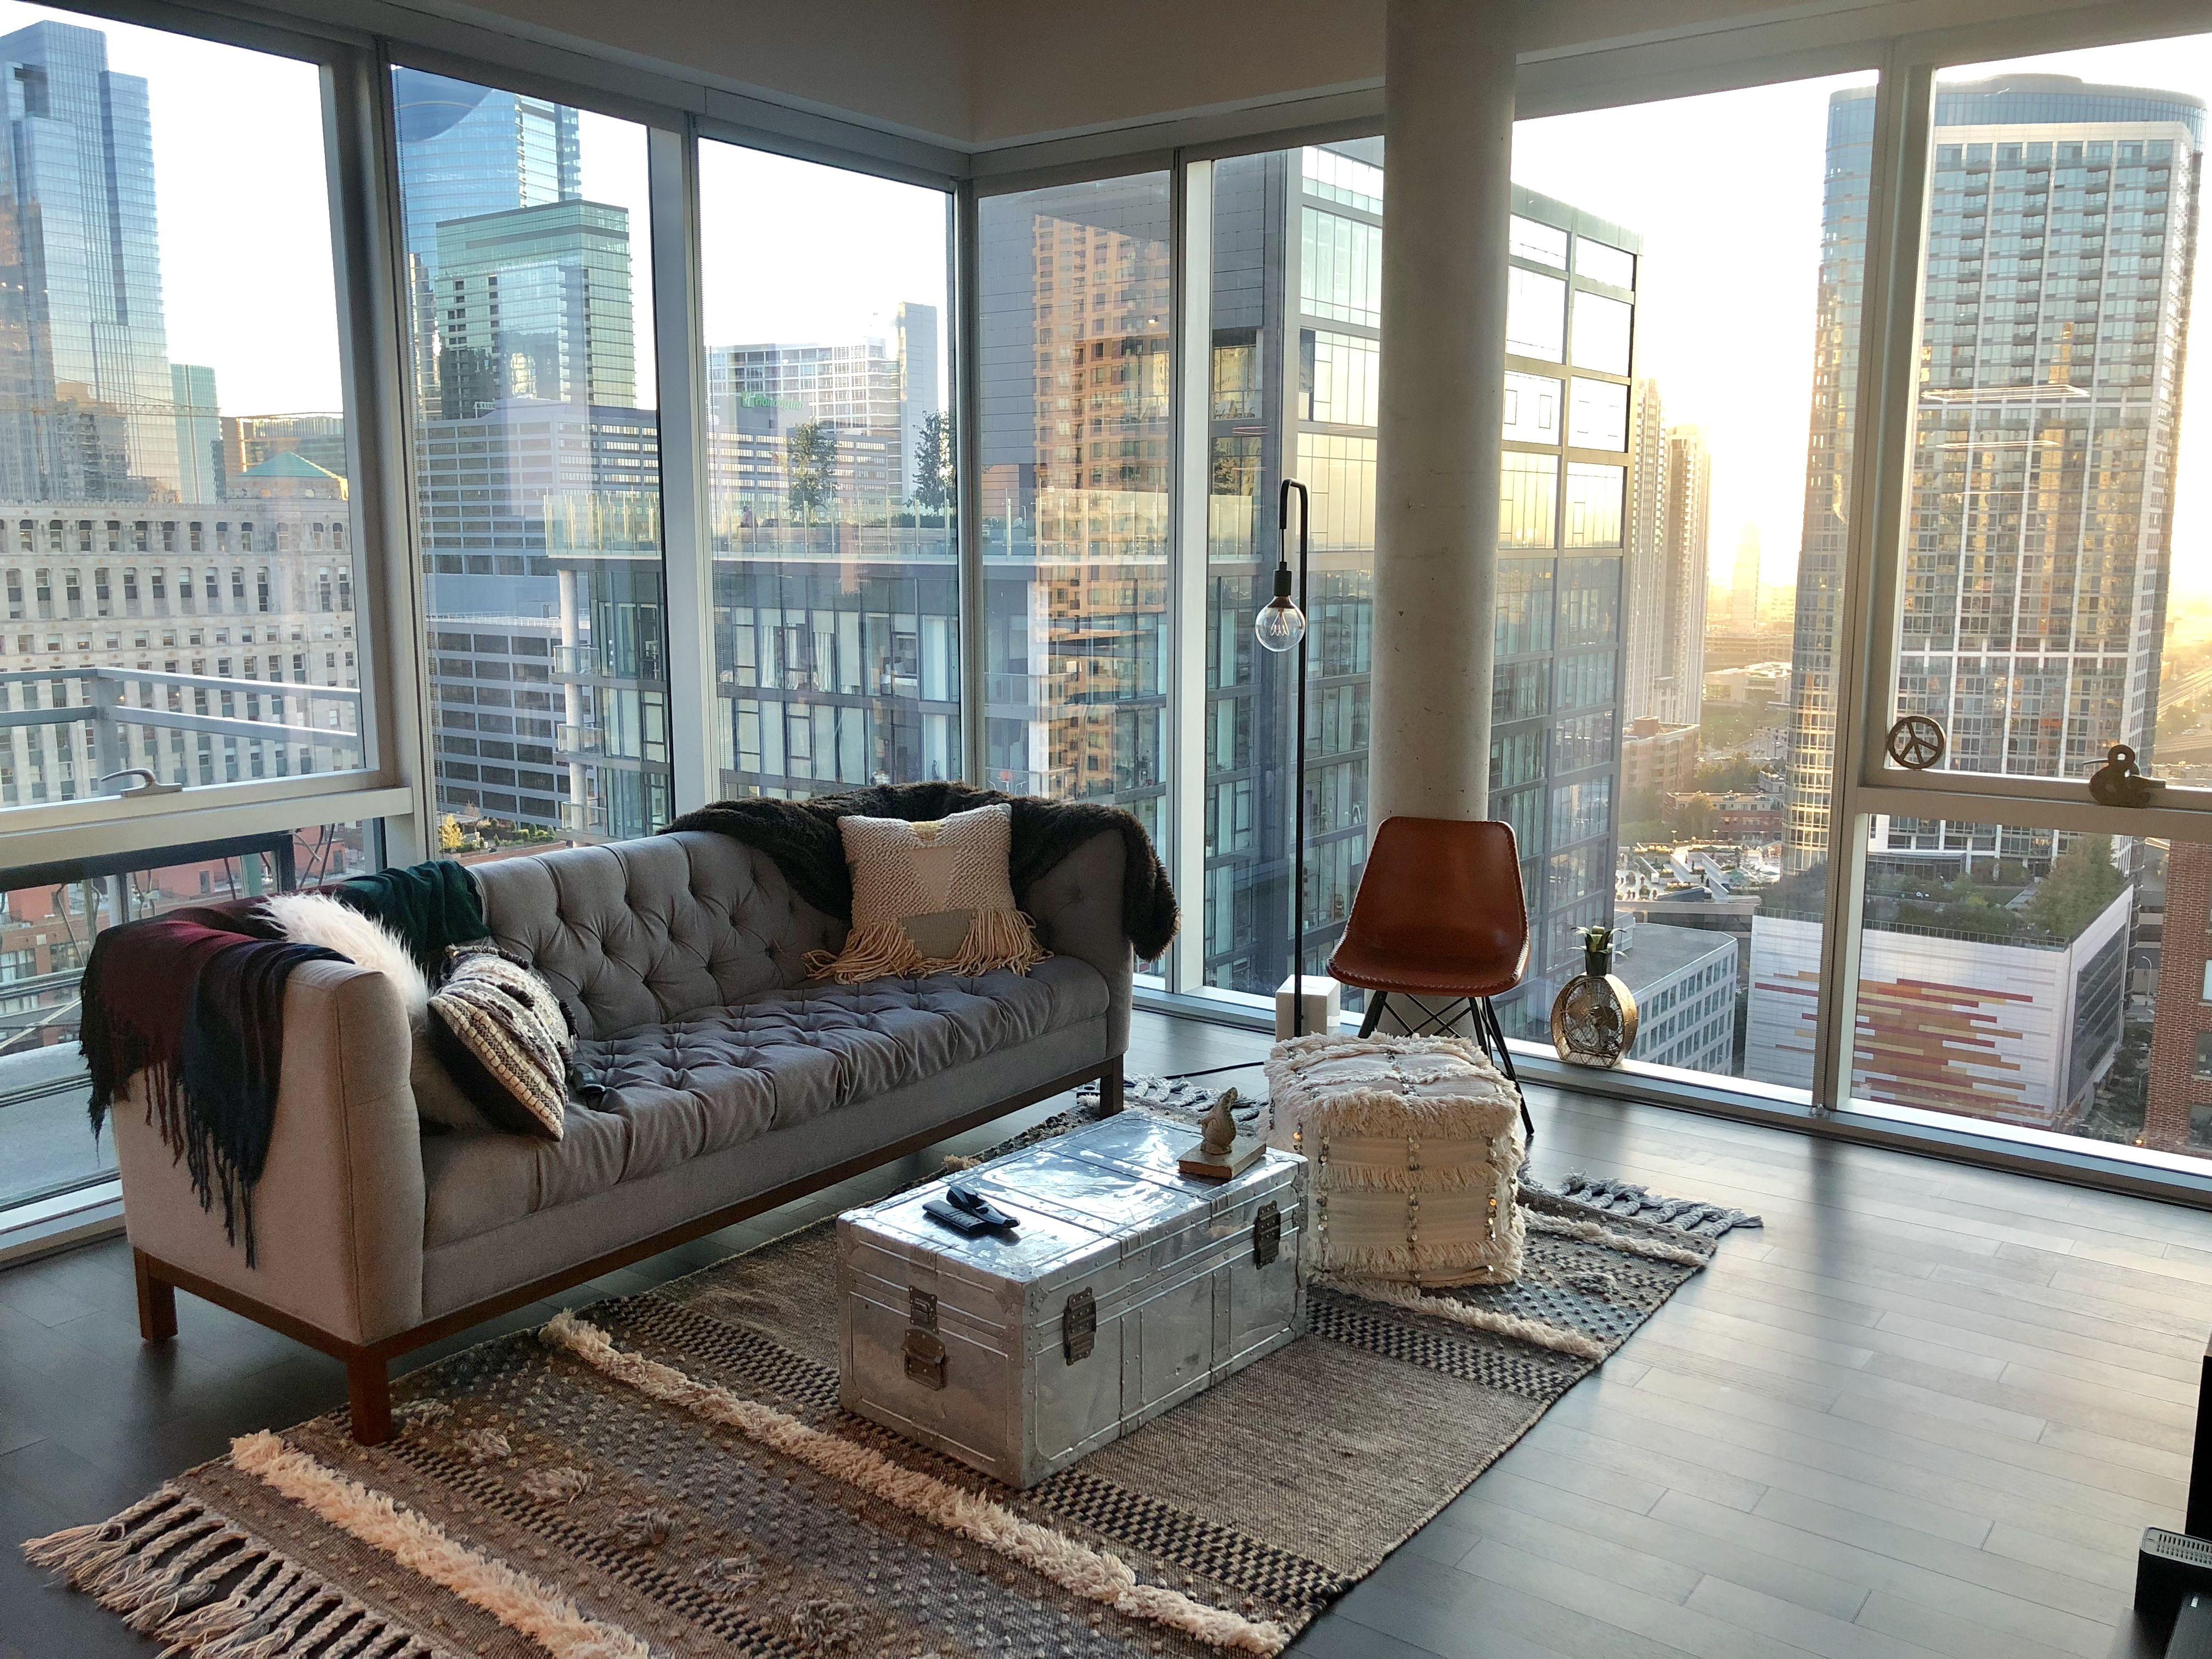 Modern Living Room With Floor To Ceiling Windows Hardwood Floors